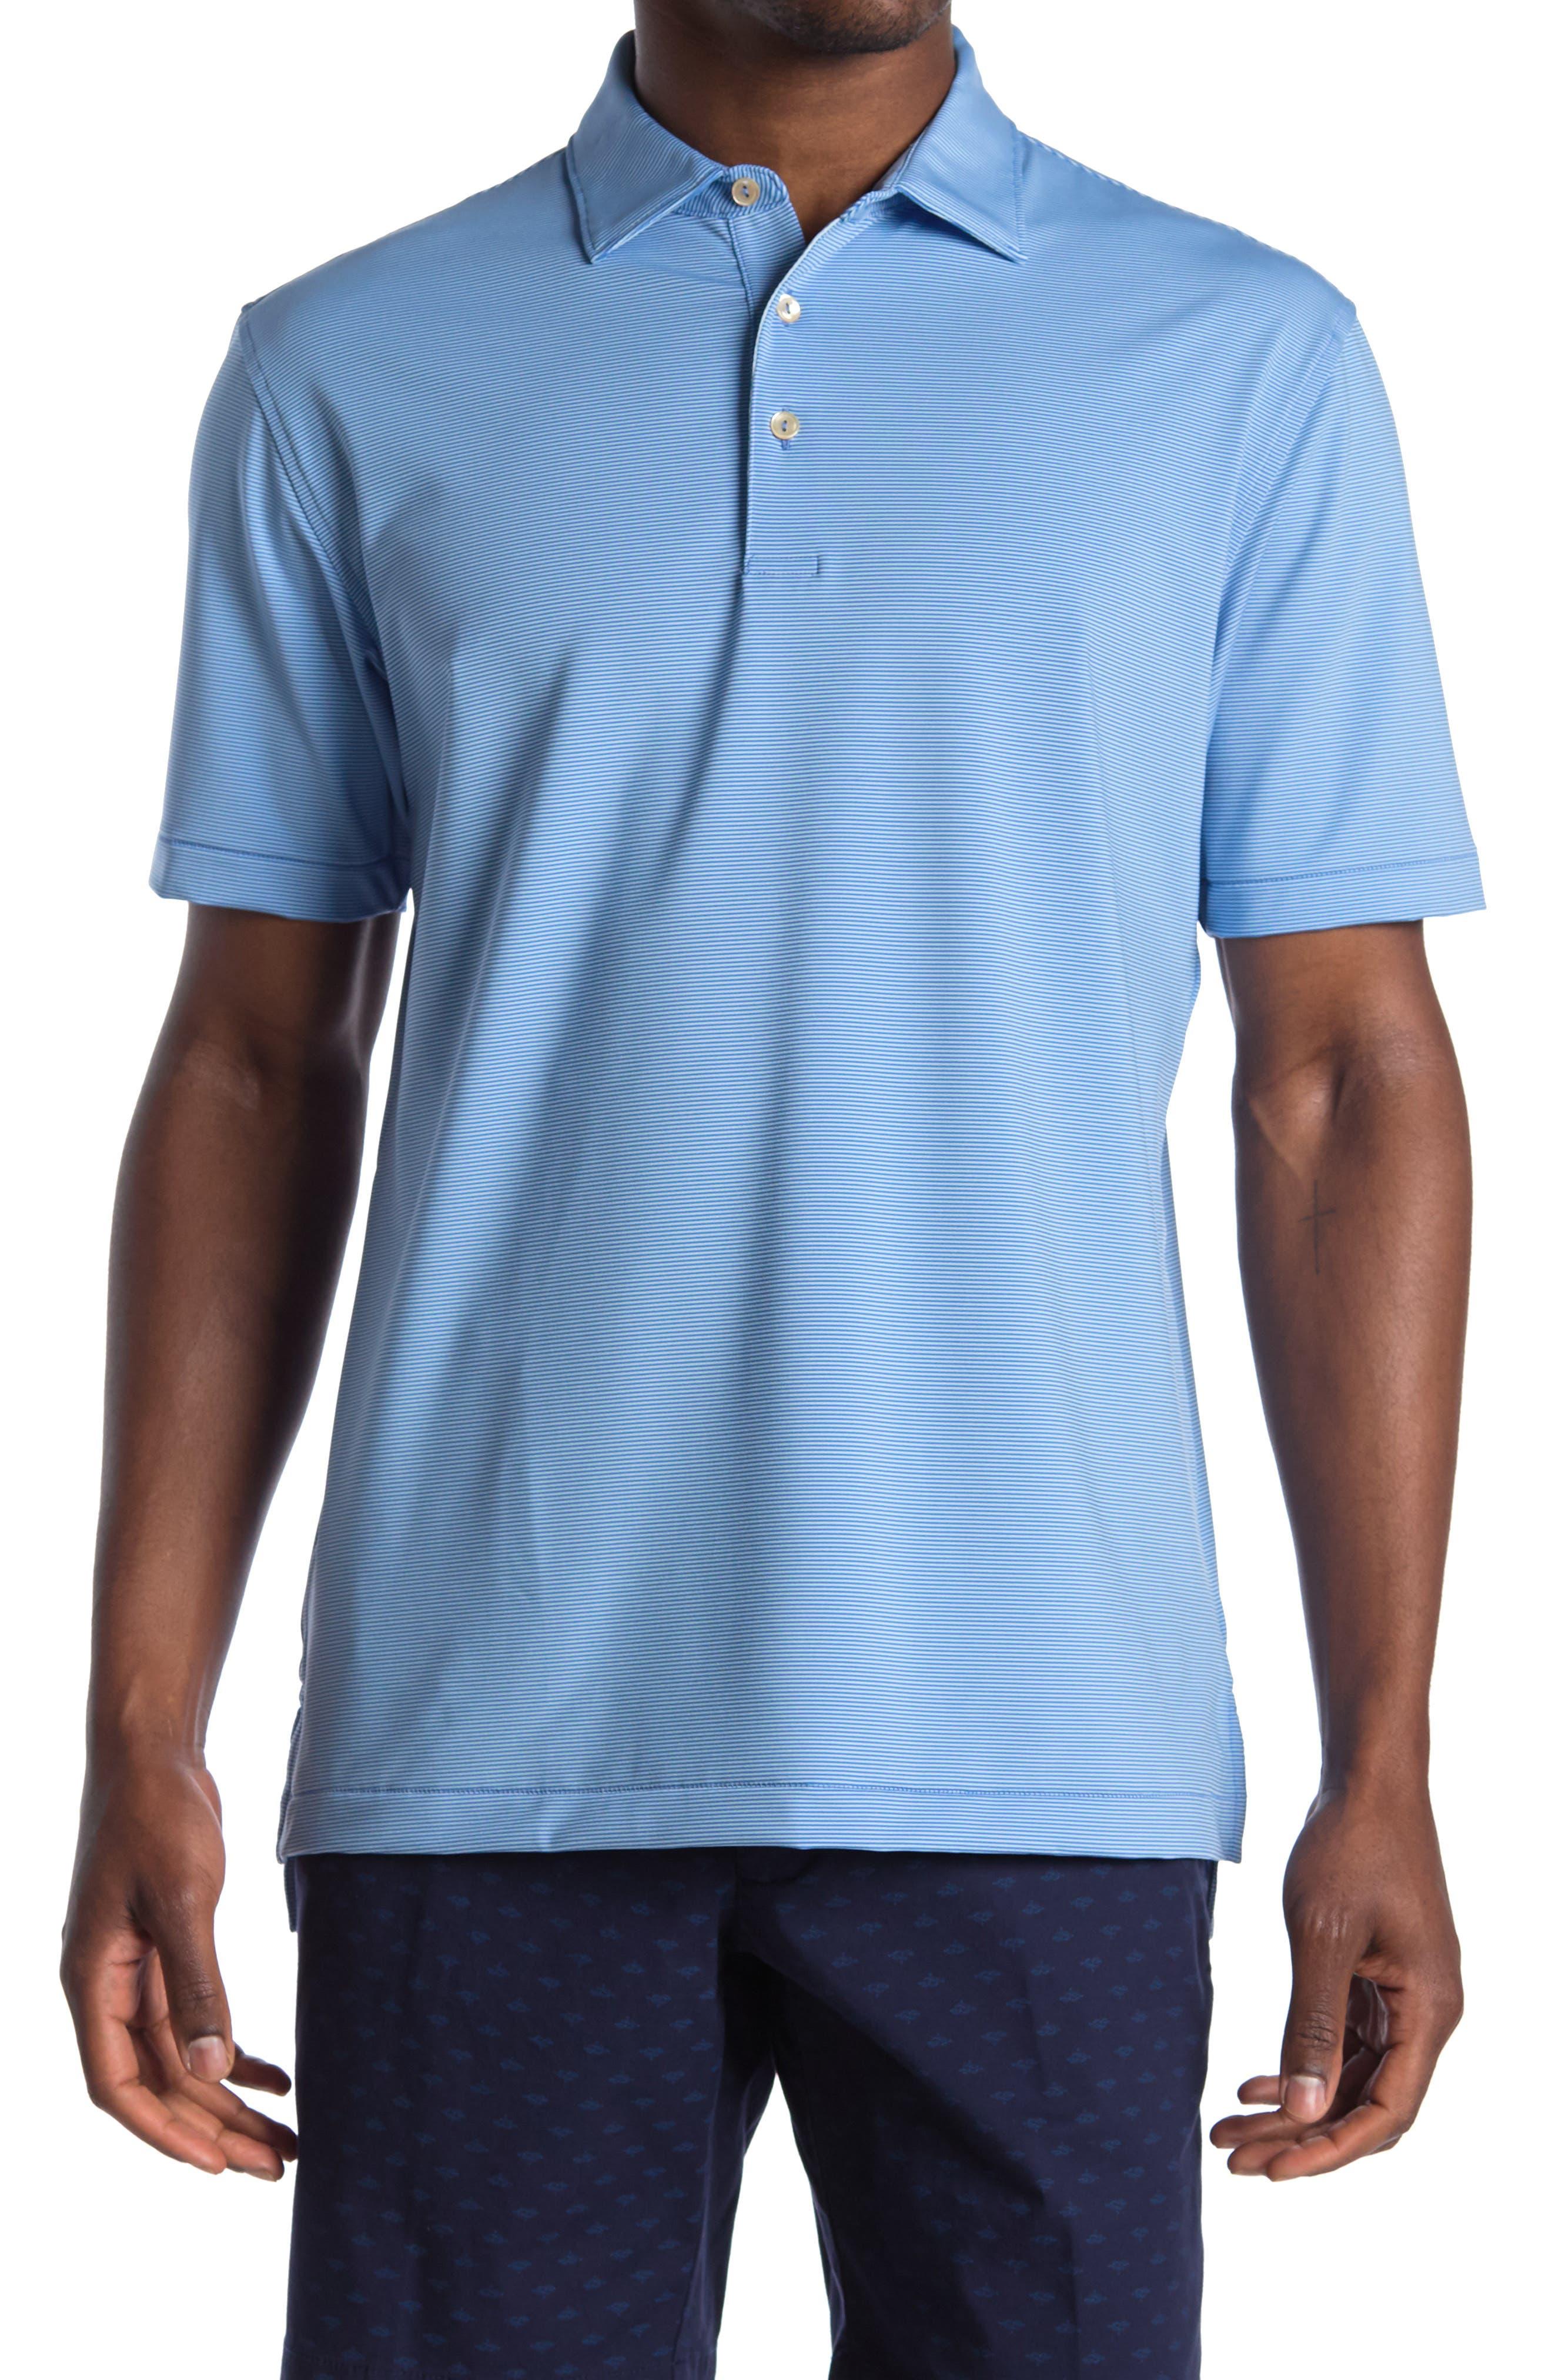 Image of Peter Millar Jubilee Striped Jersey Polo Shirt